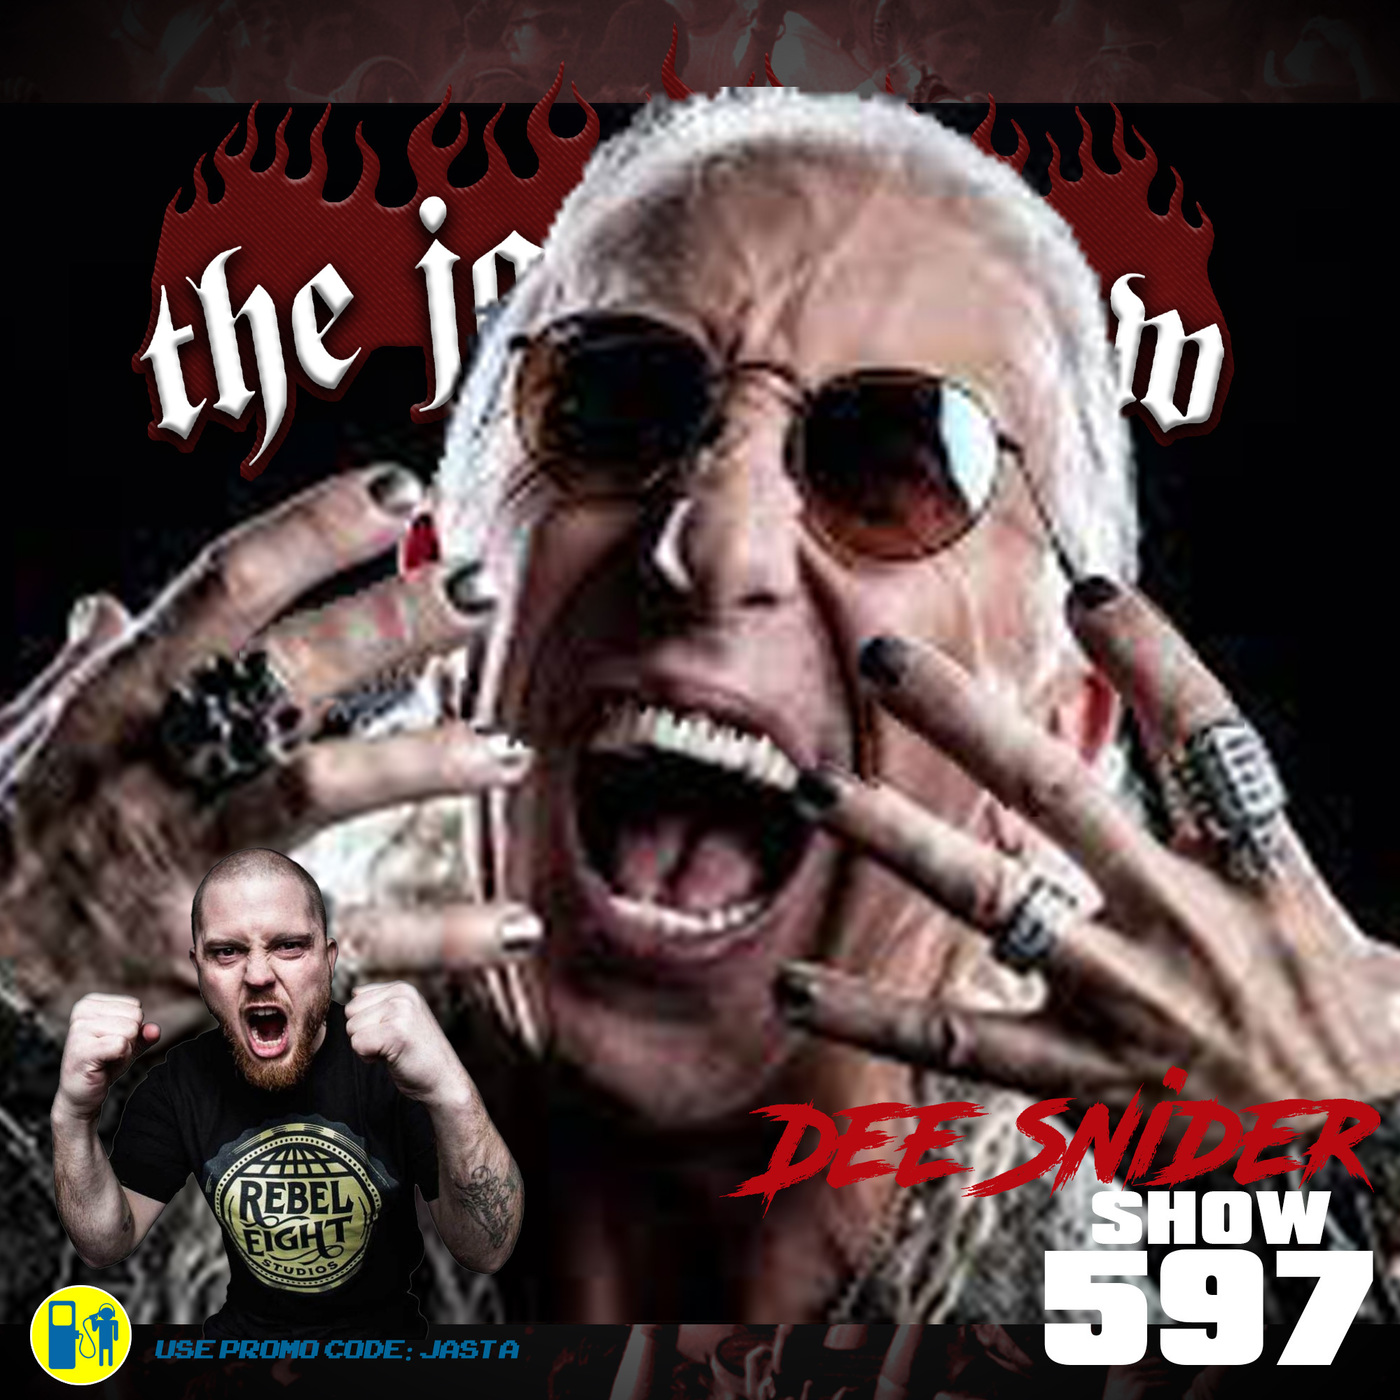 Show #597 - Dee Snider